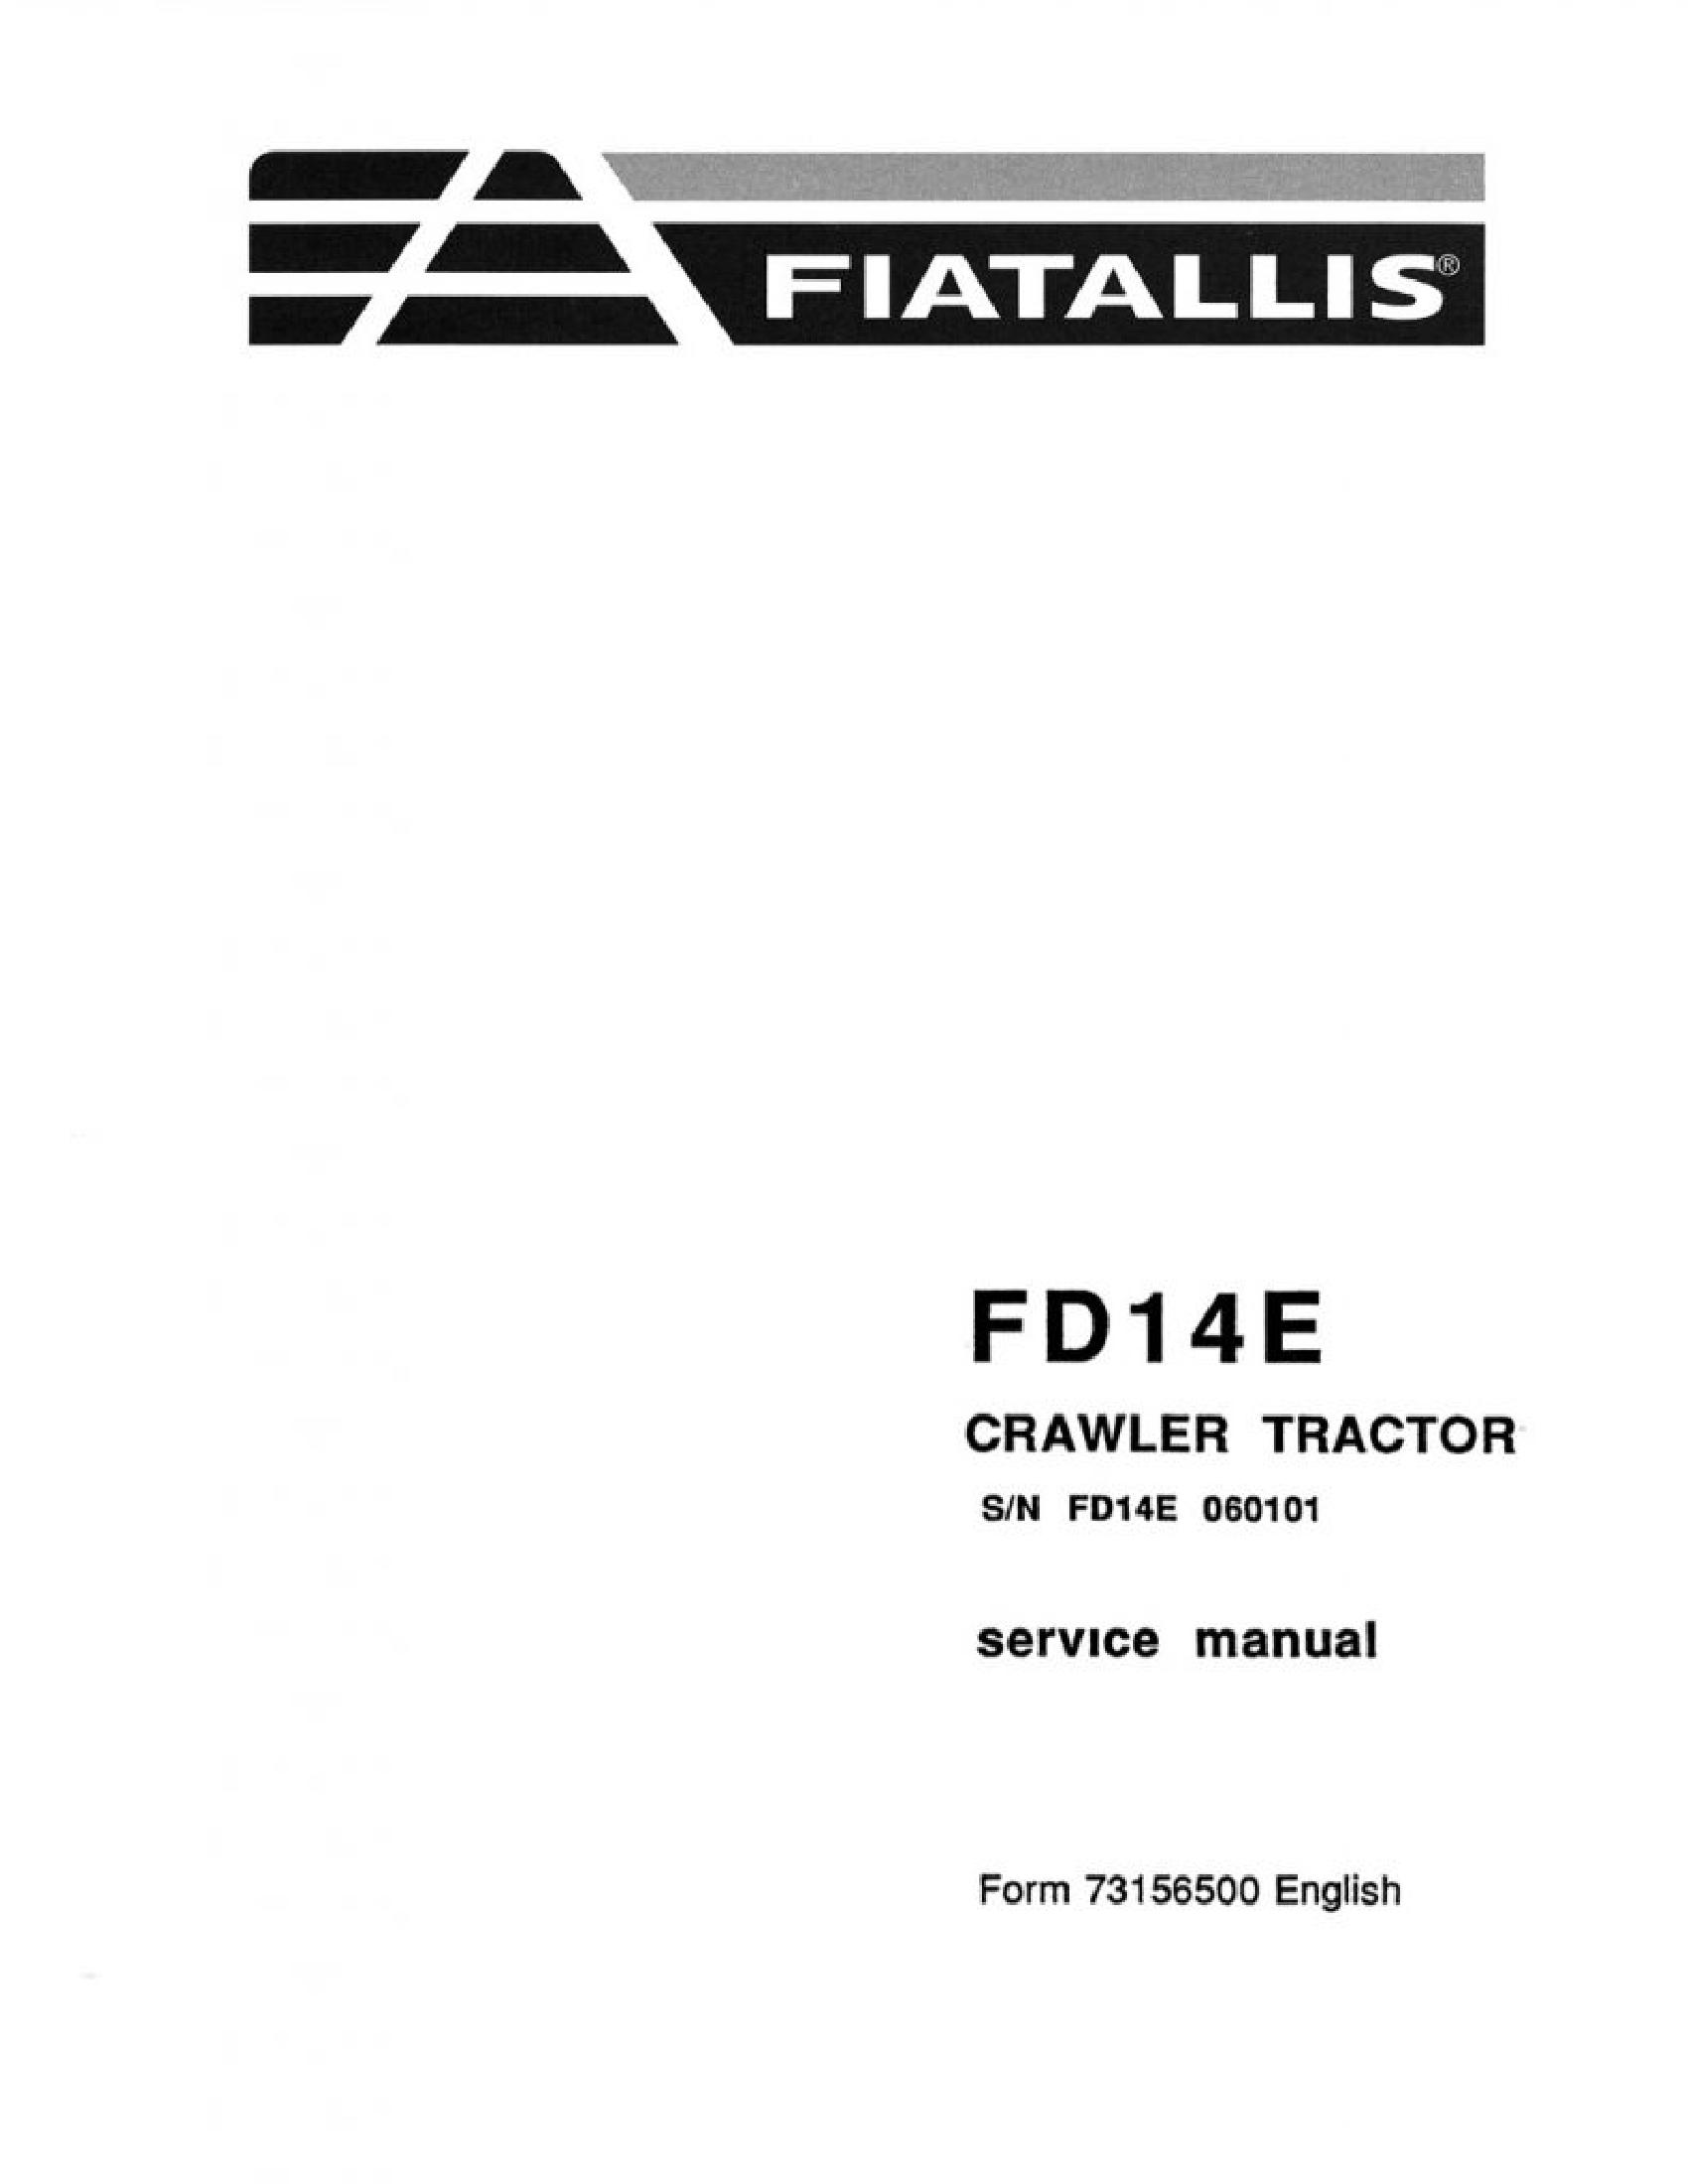 Fiat-Allis 14E FD Crawler Tractor manual